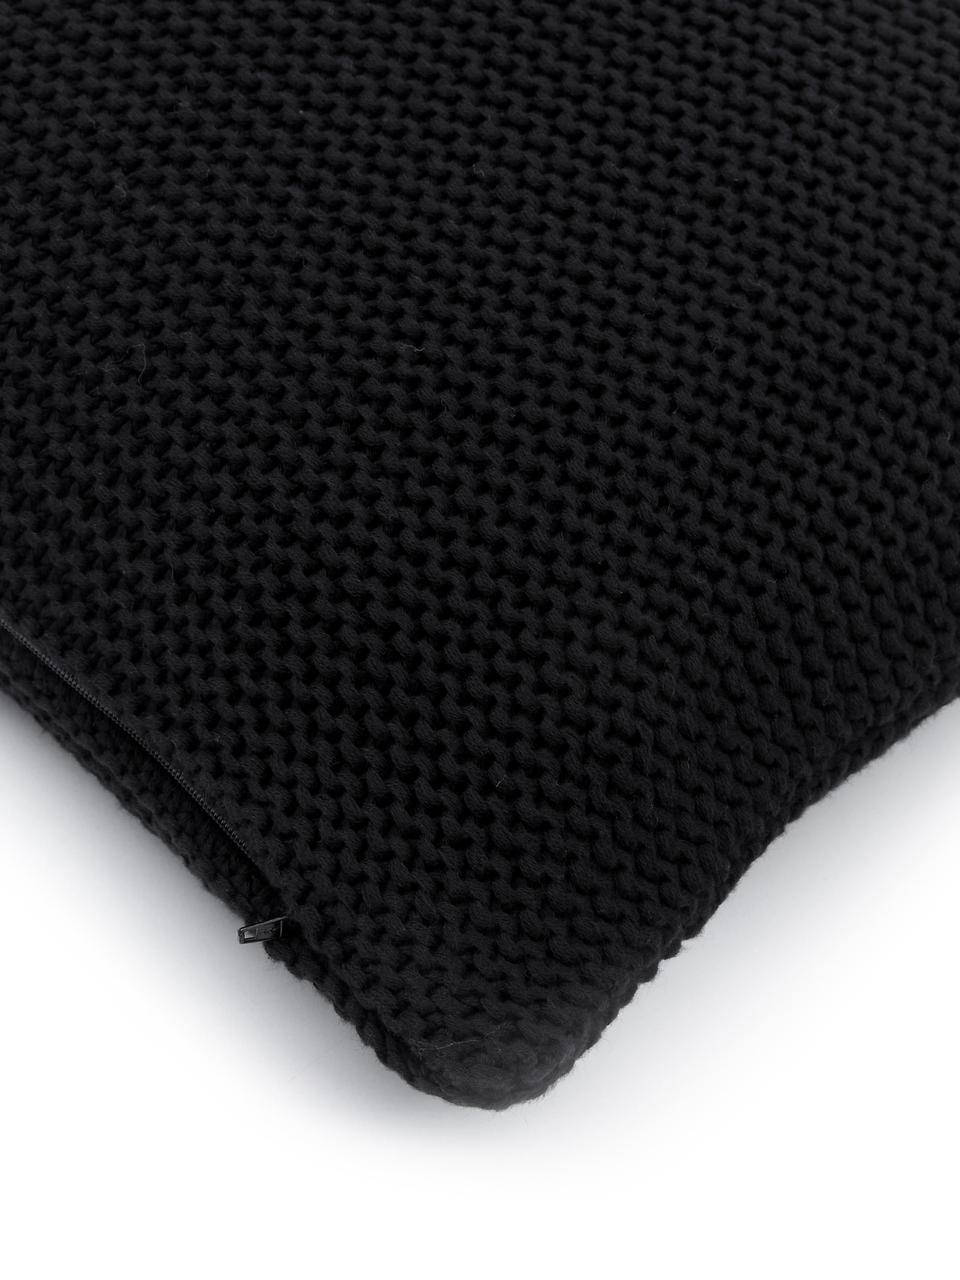 Pletený povlak na polštář Adalyn, Černá